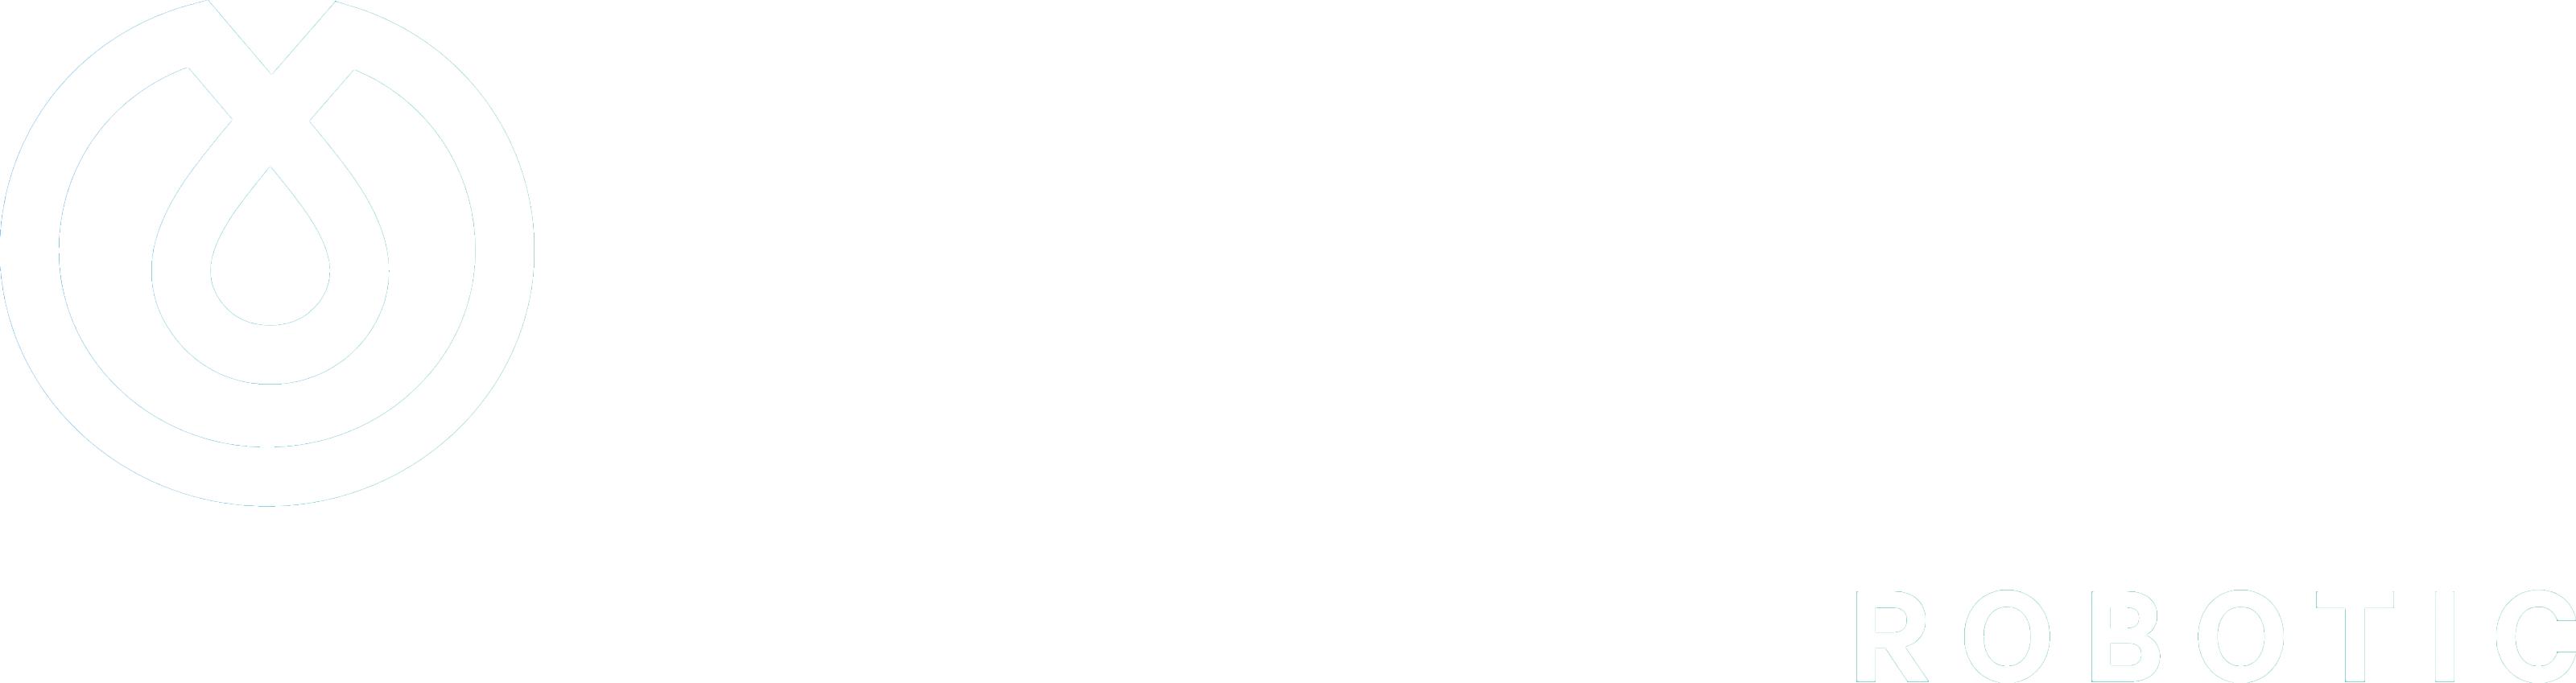 Omnirobotic